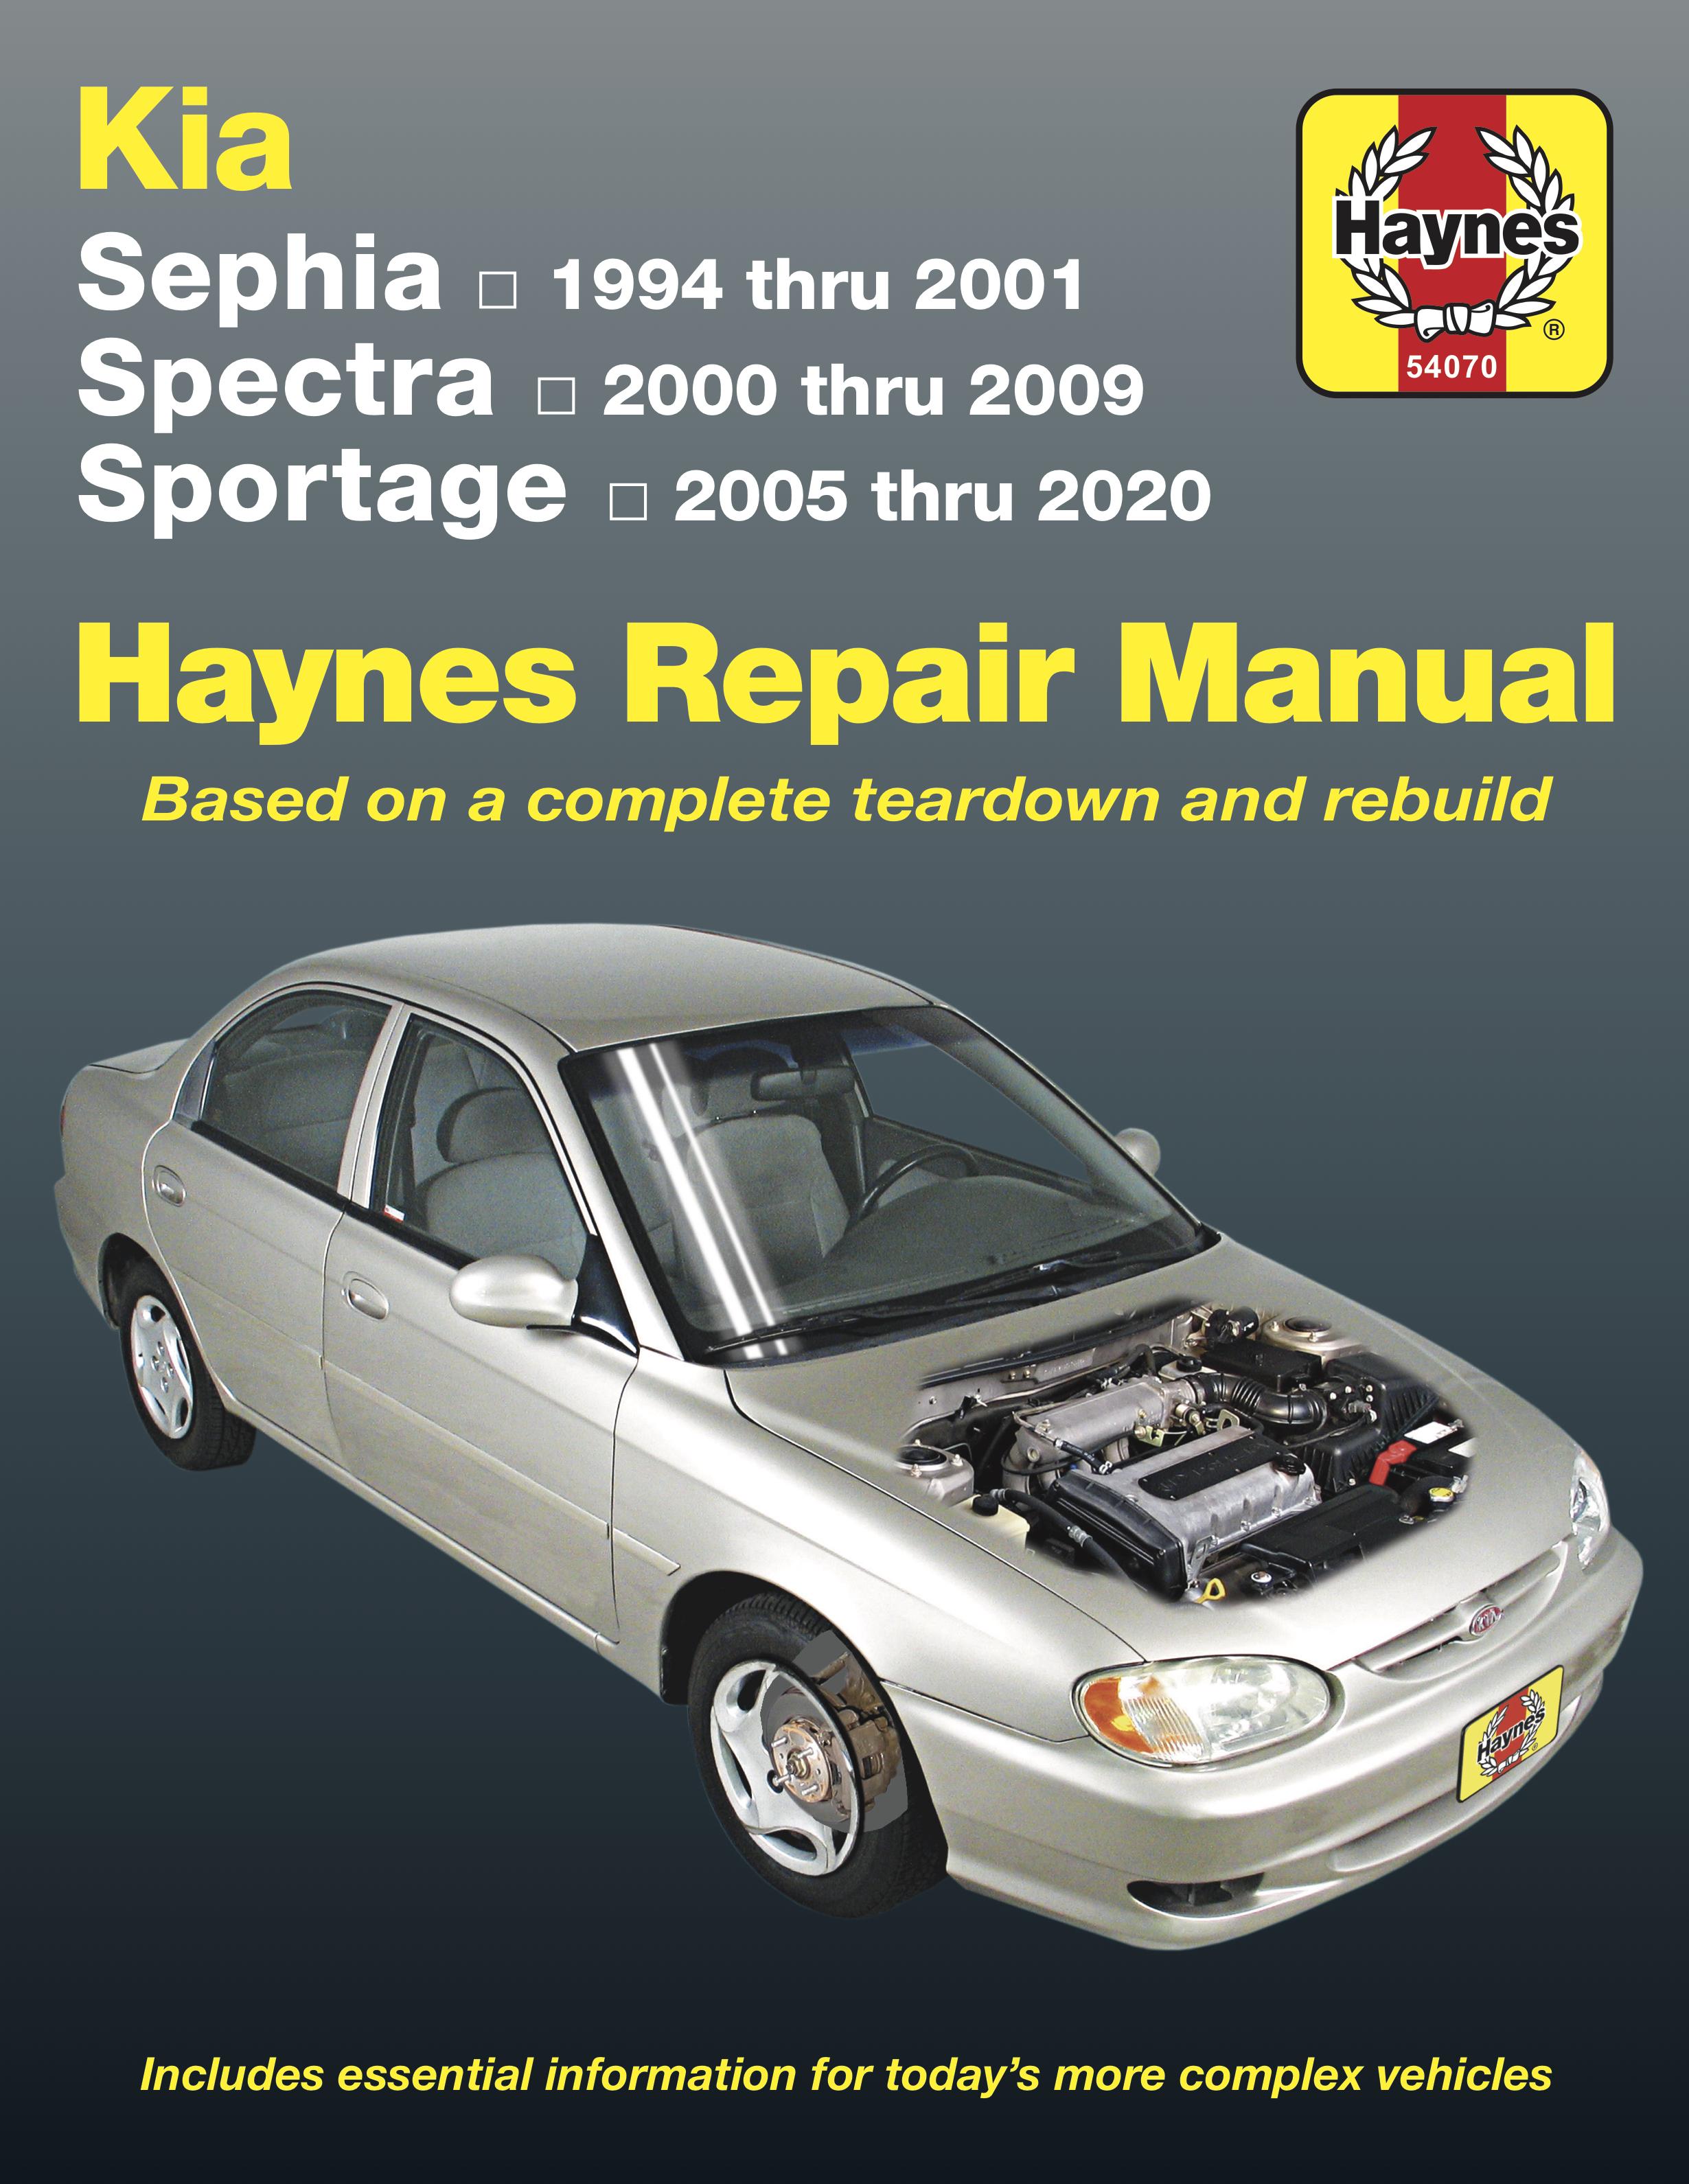 Sephia Haynes Manuals